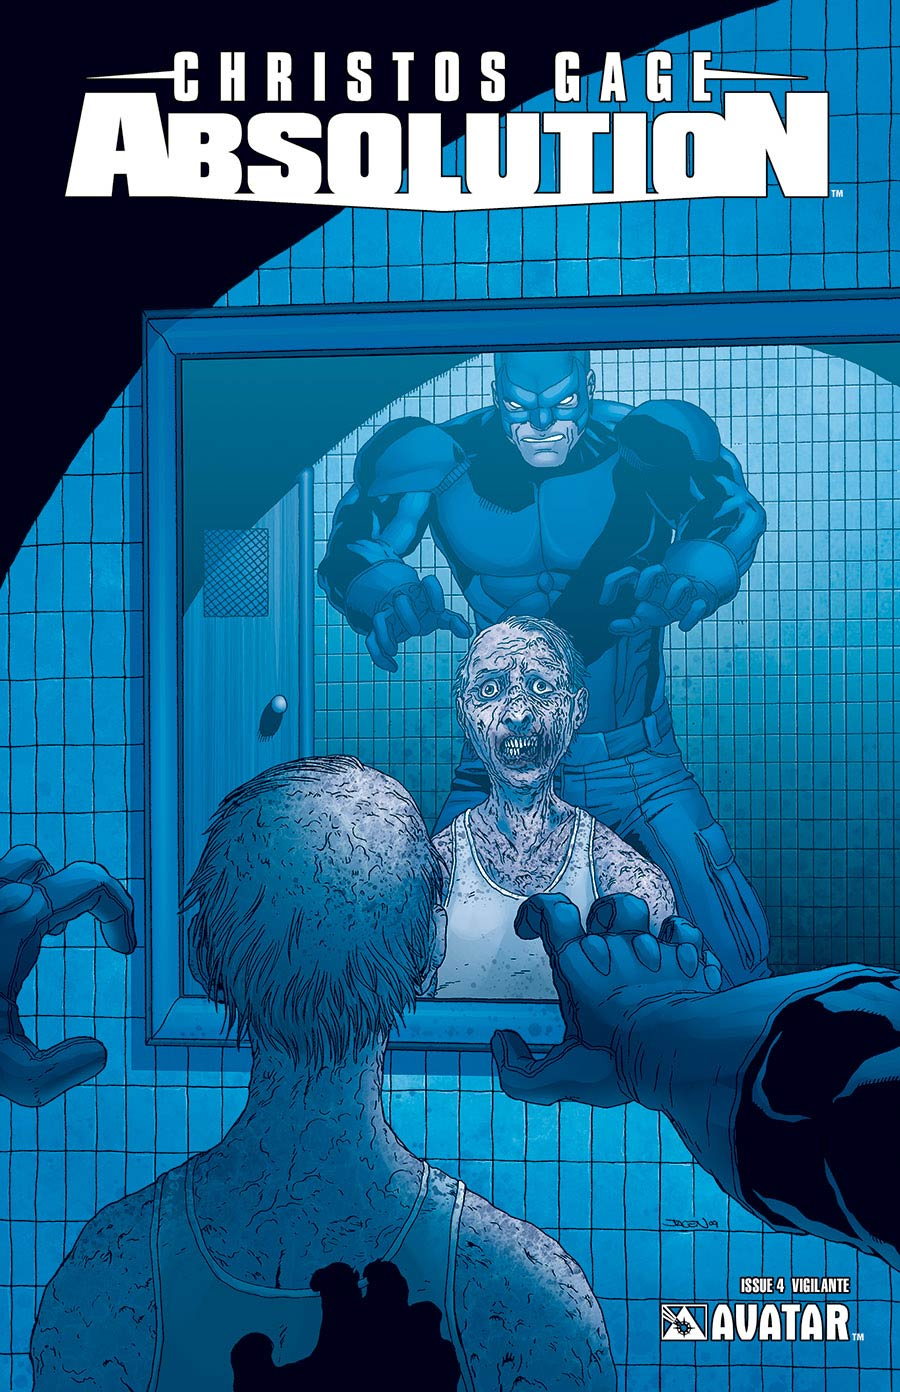 Absolution #4 Vigilante Cover (Sale Edition)